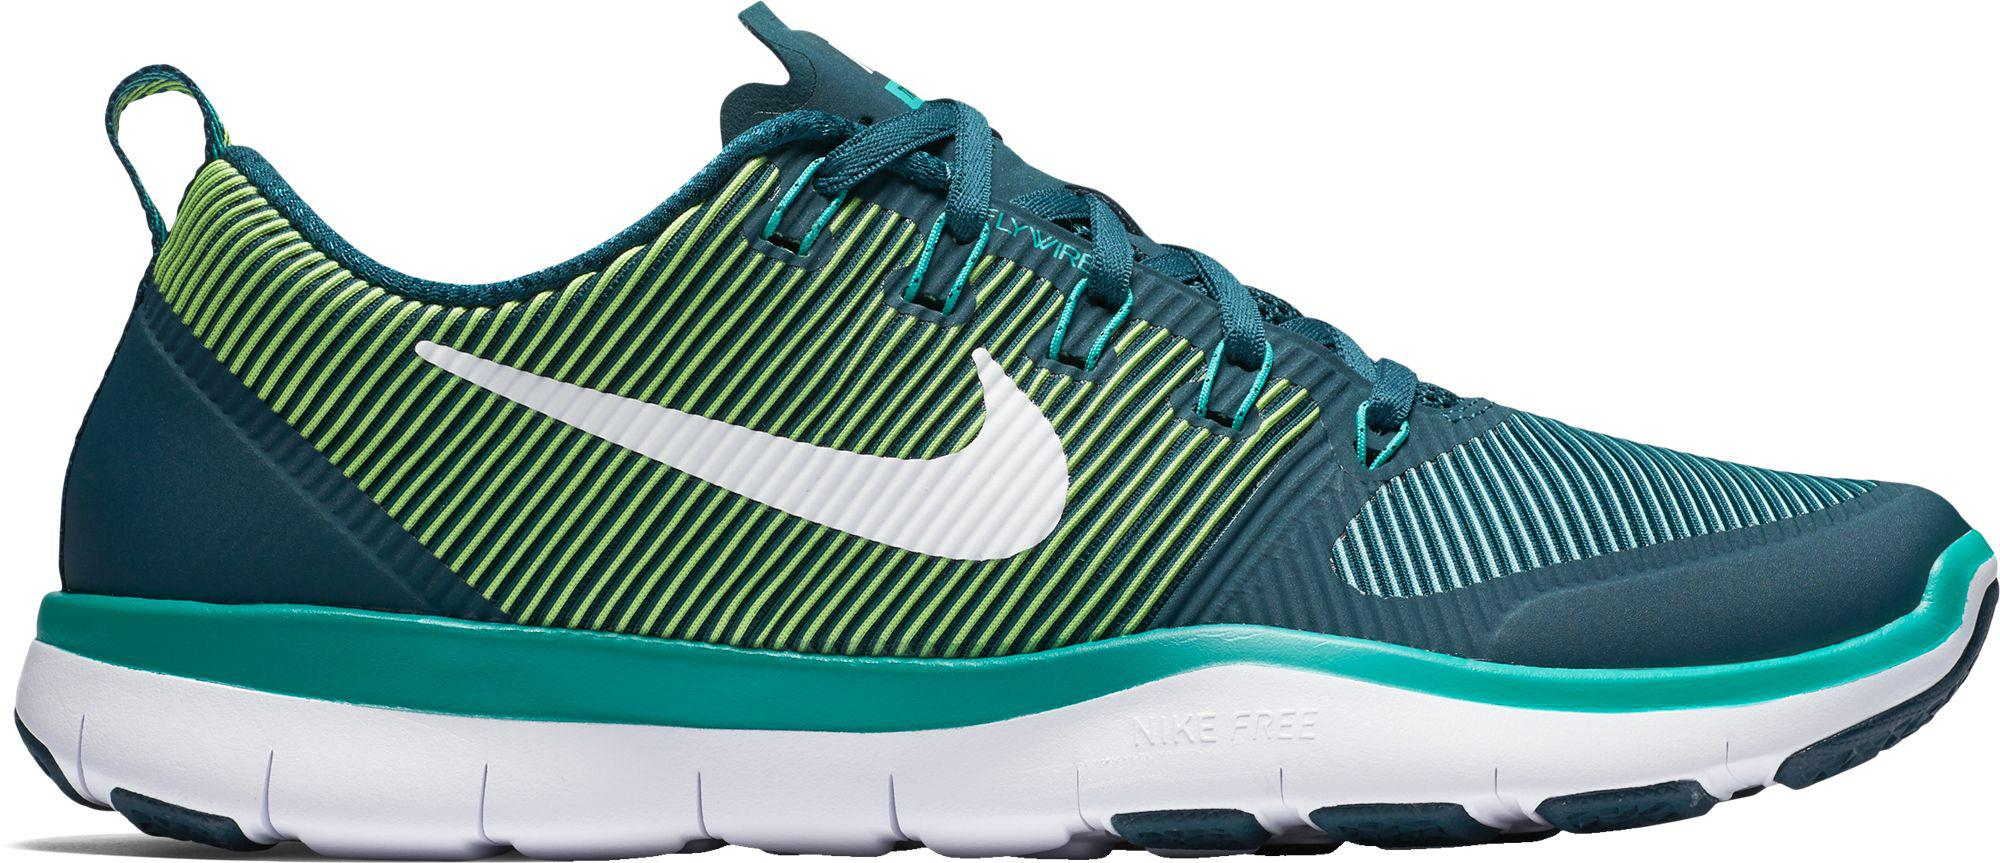 68ff6b305801 Lyst - Nike Free Train Versatility Training Shoes in Blue for Men